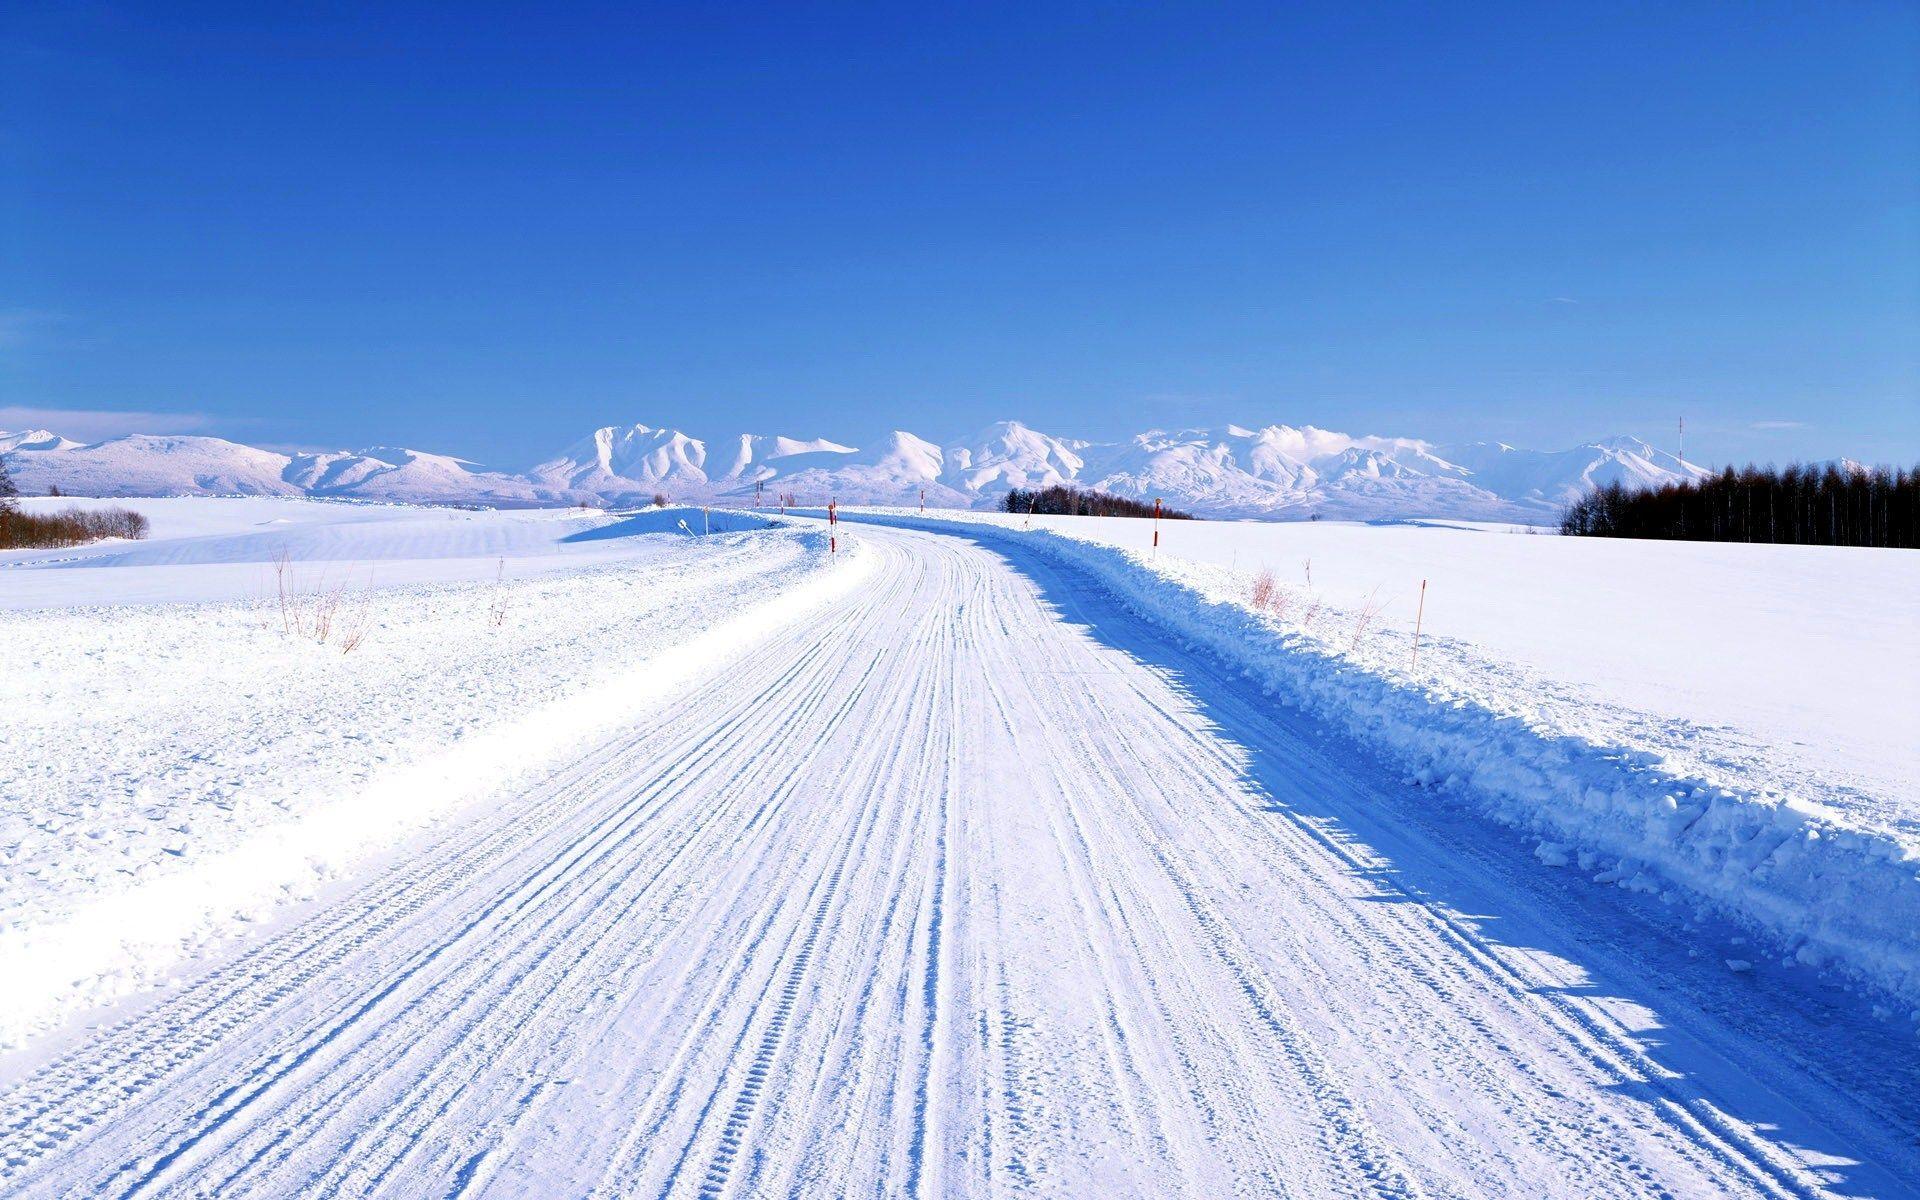 winter wallpaper for desktop background - winter category